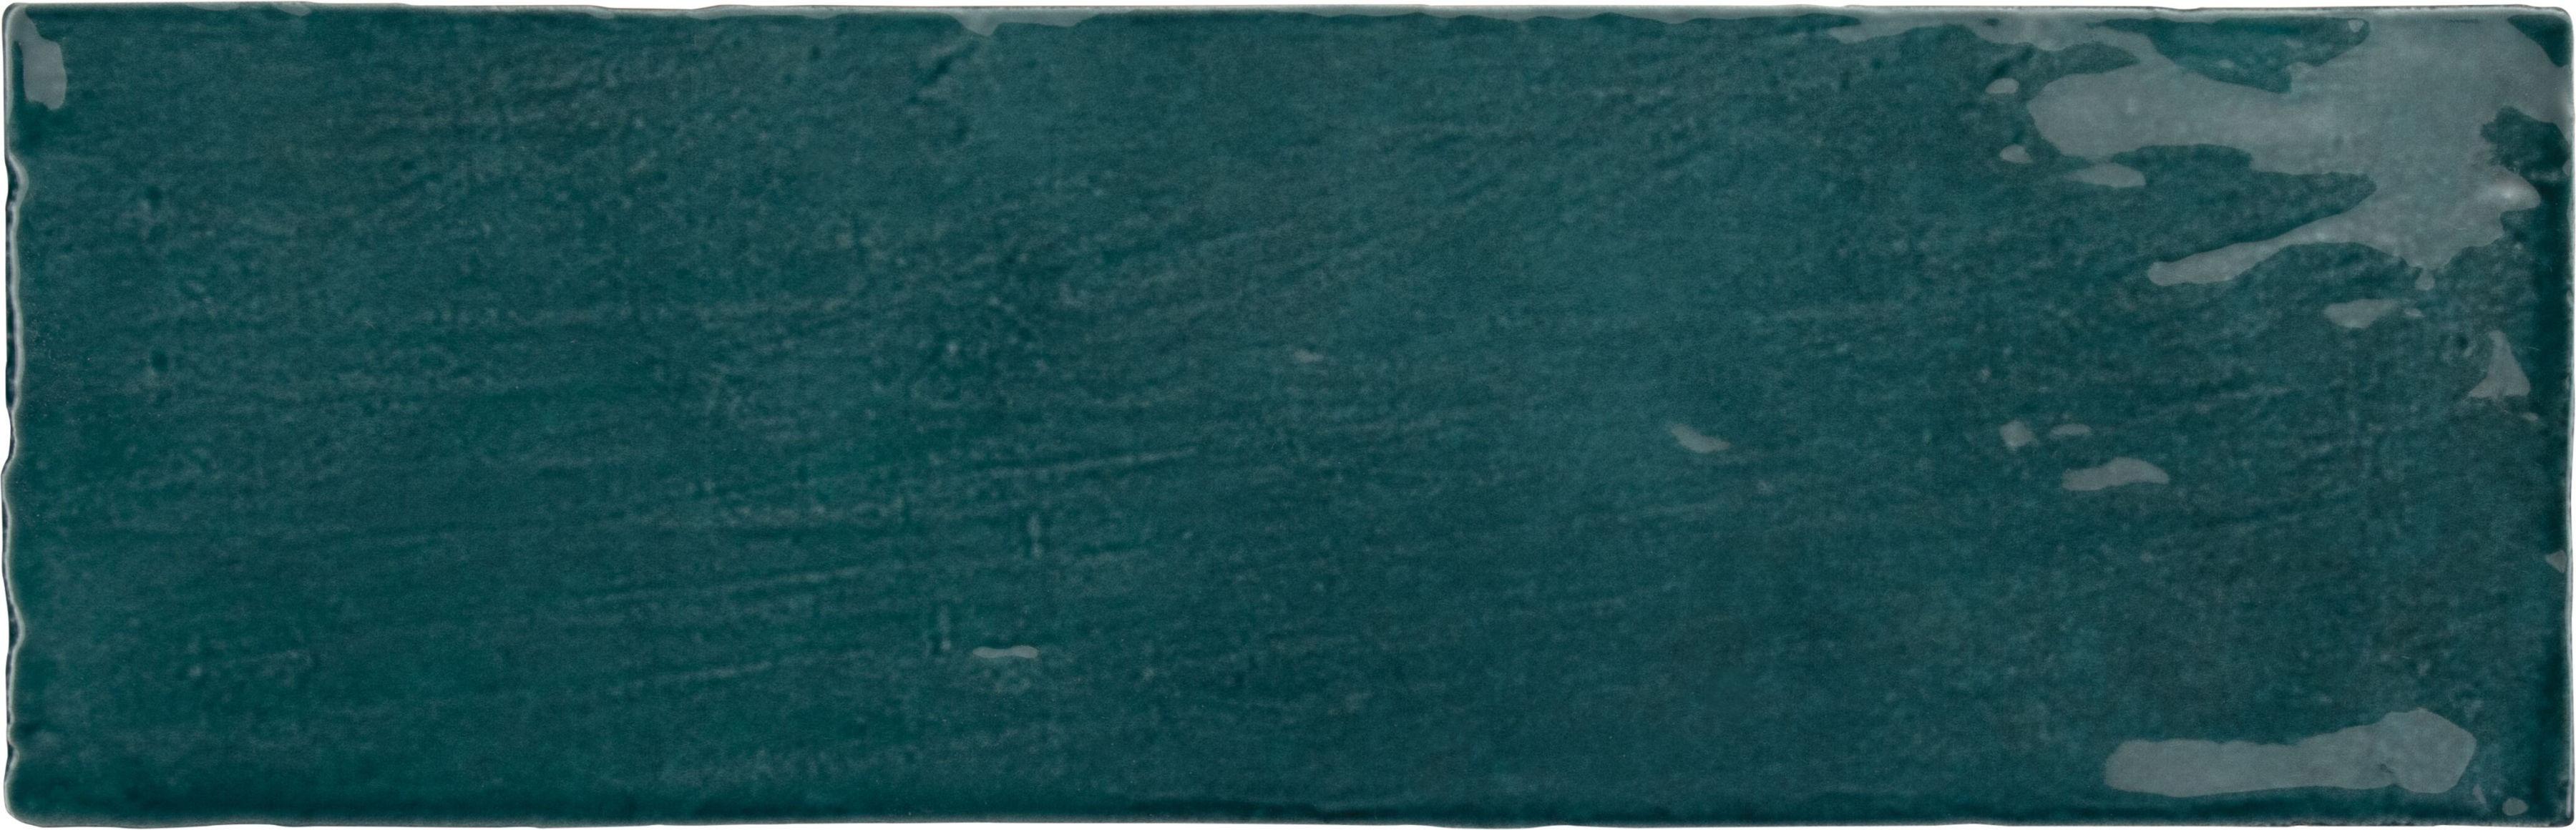 La Riviera Quetzal 6,5 x 20 płytki prostokąt